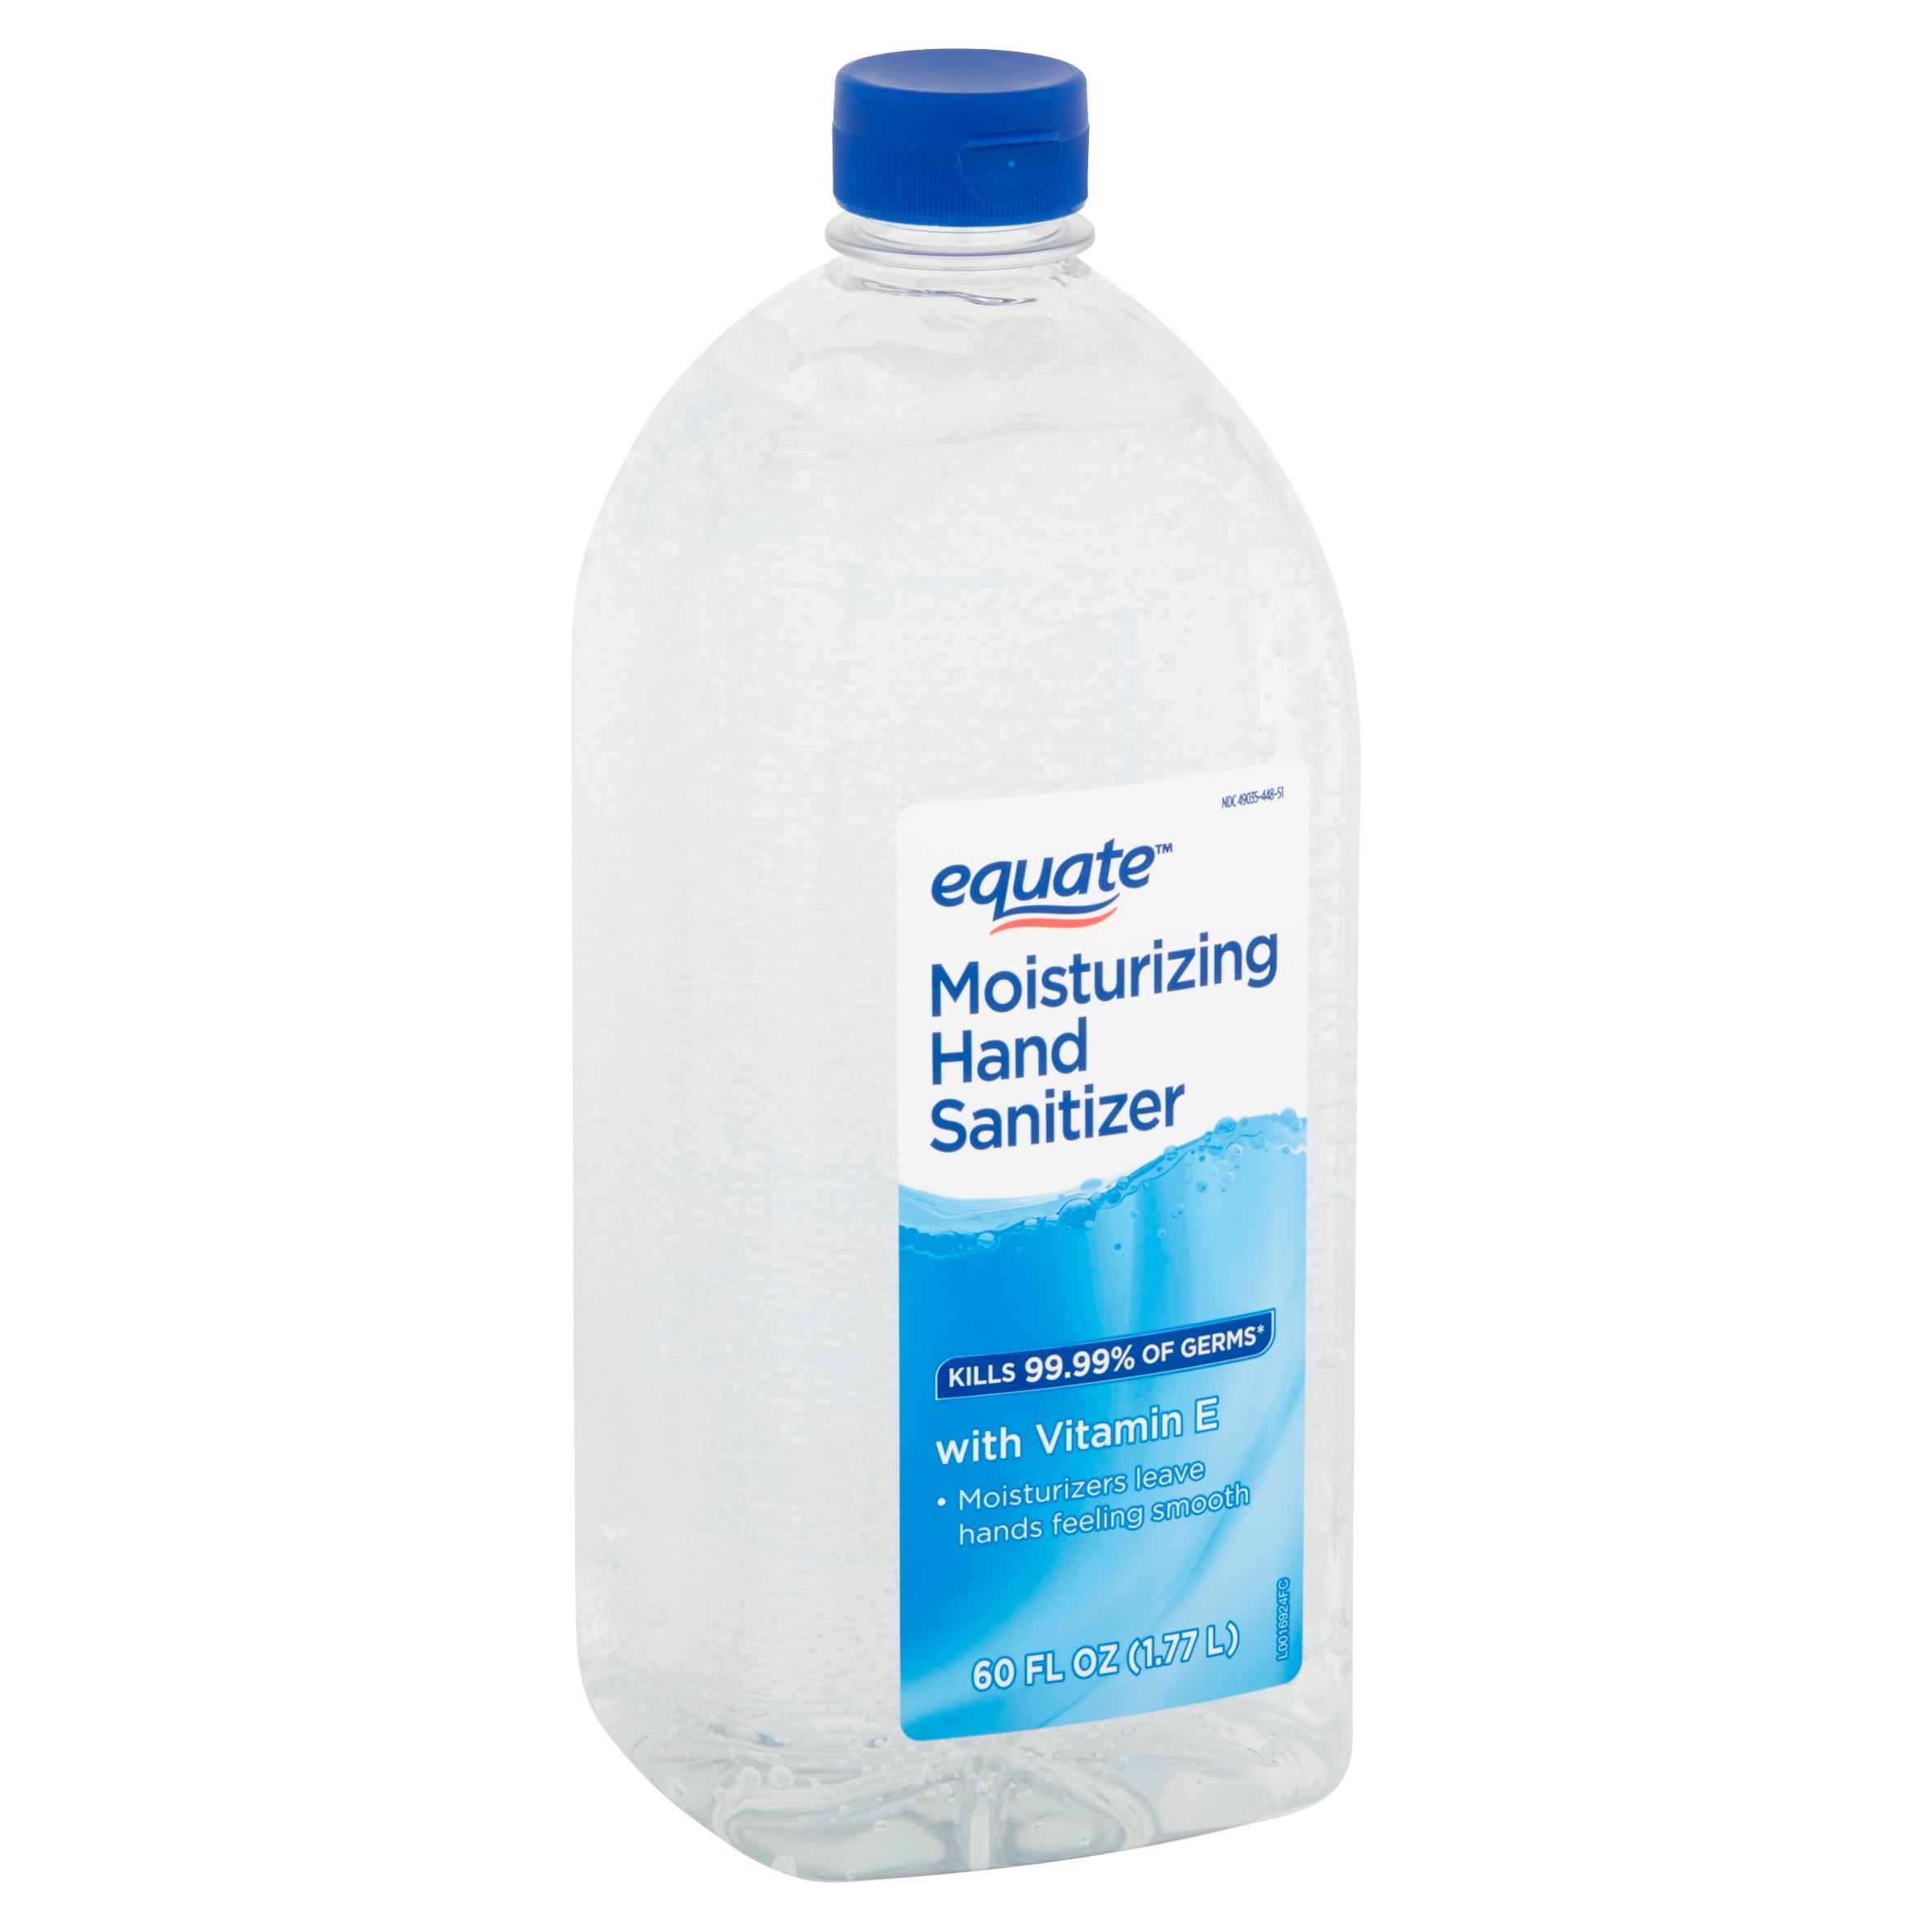 Equate Moisturizing Hand Sanitizer, 60 fl oz $5.97